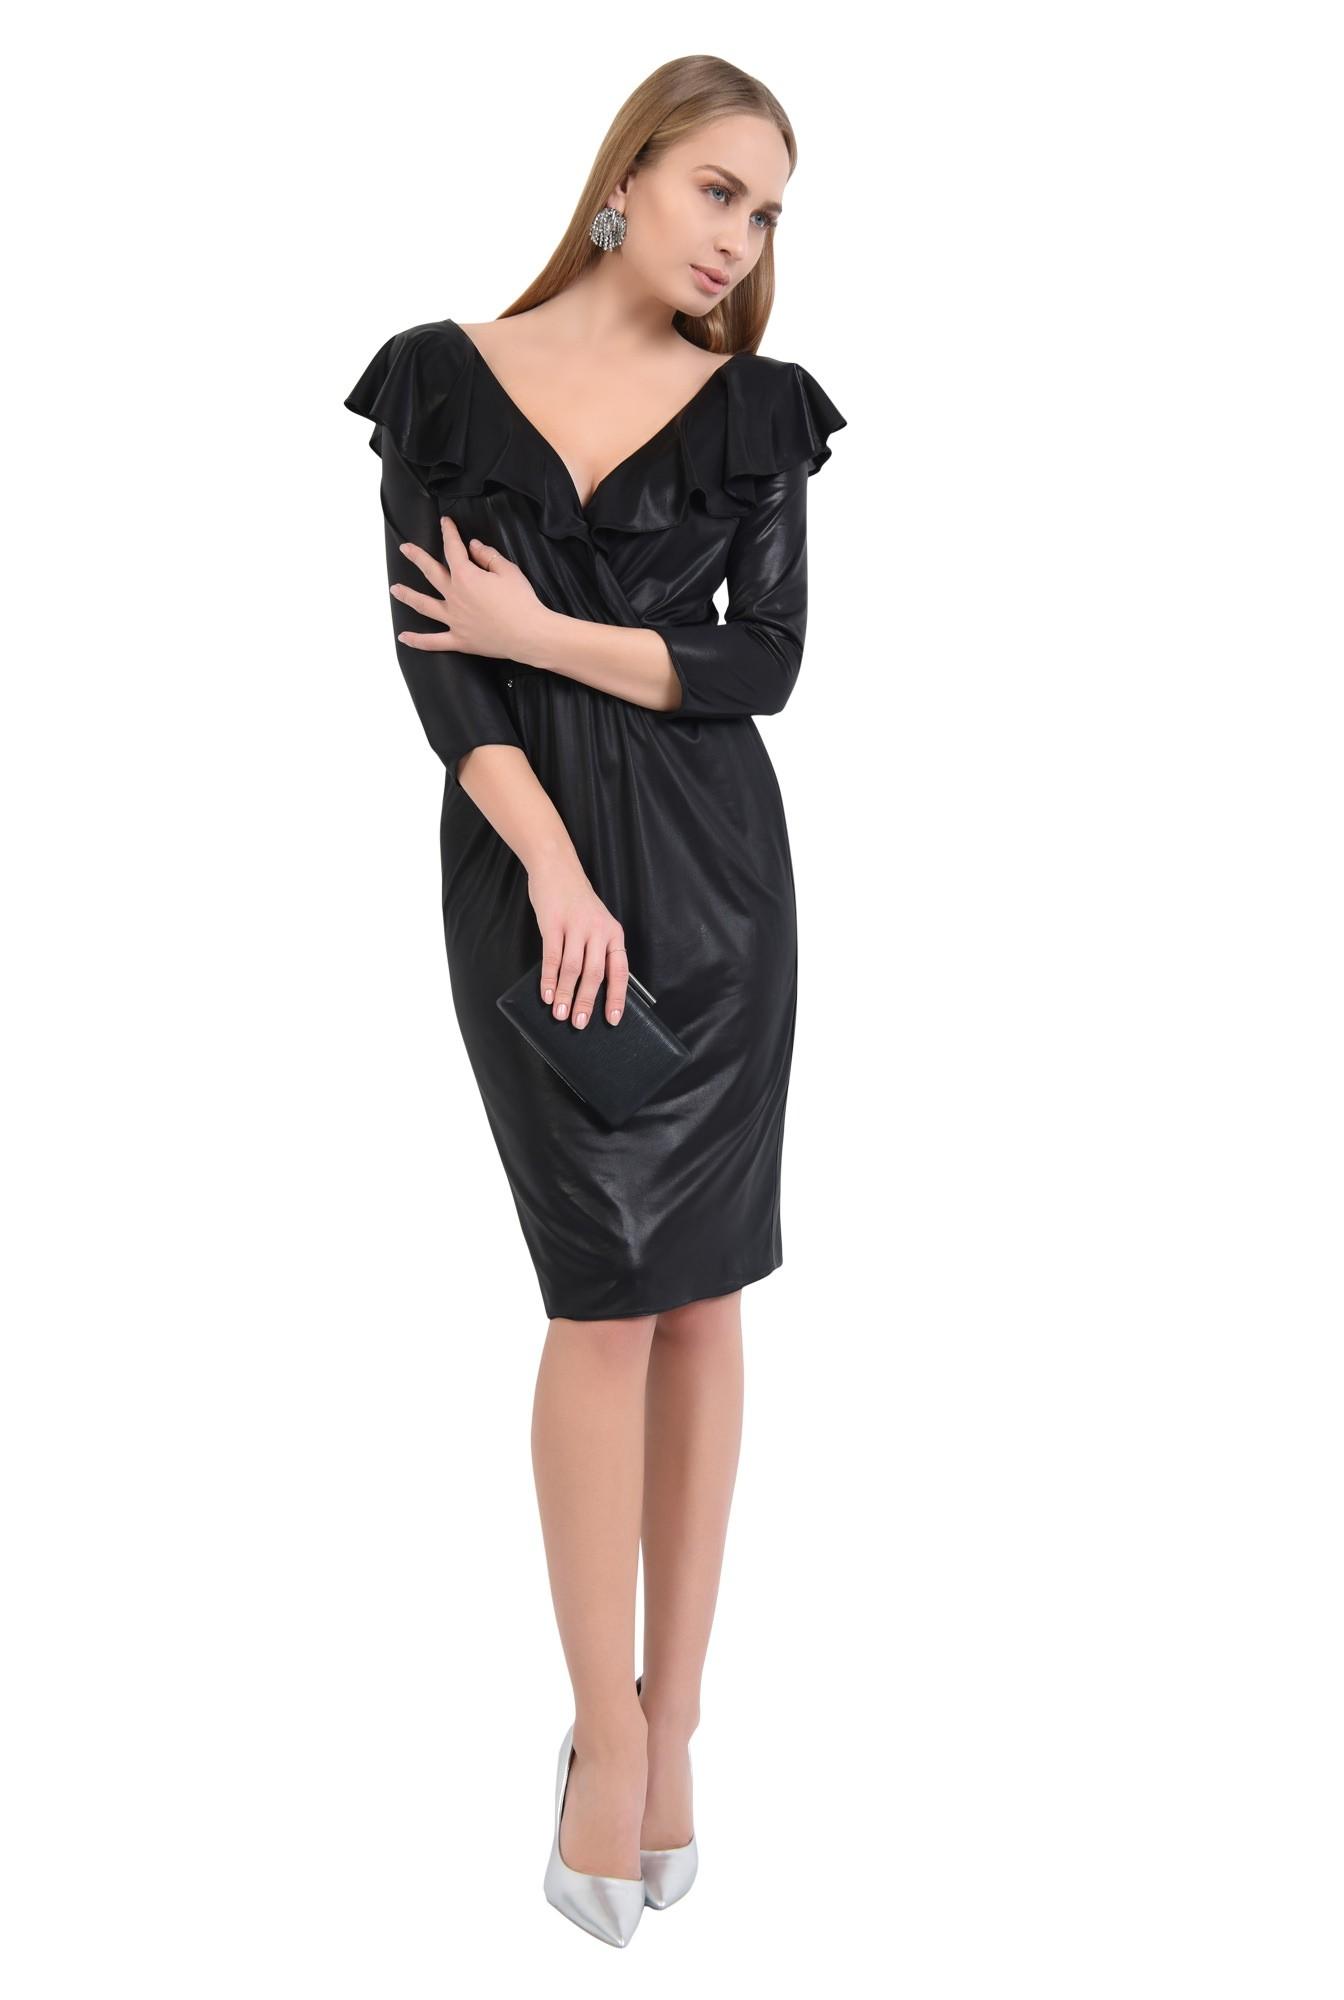 0 - rochie neagra, de ocazie, midi, cambrata cu elastic, cu volane